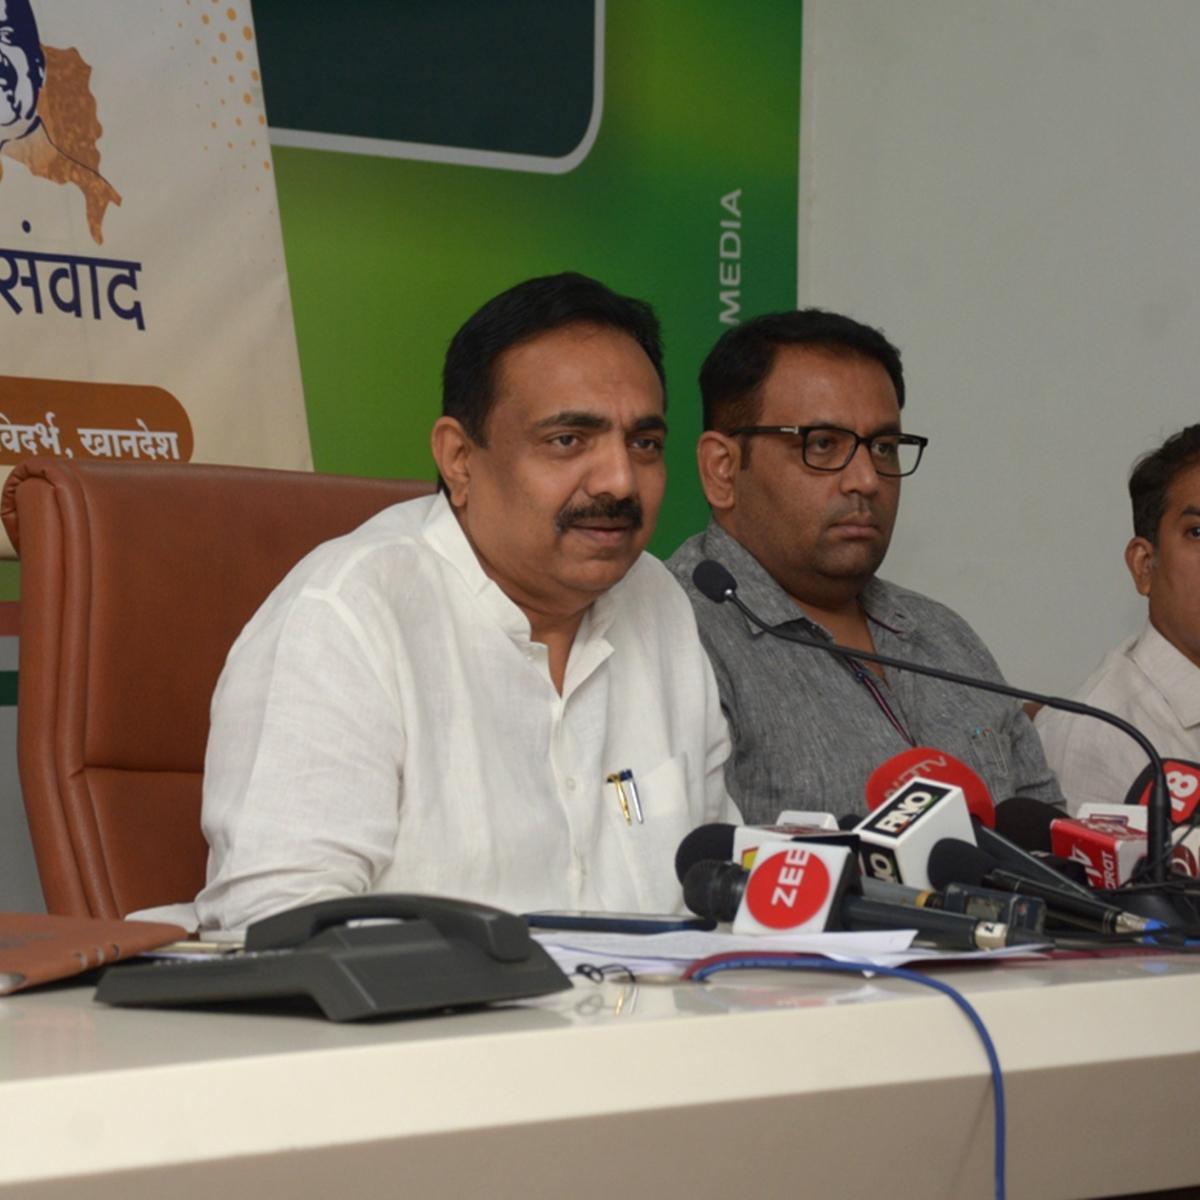 Mumbai: No tie up between NCP and BJP, says Jayant Patil